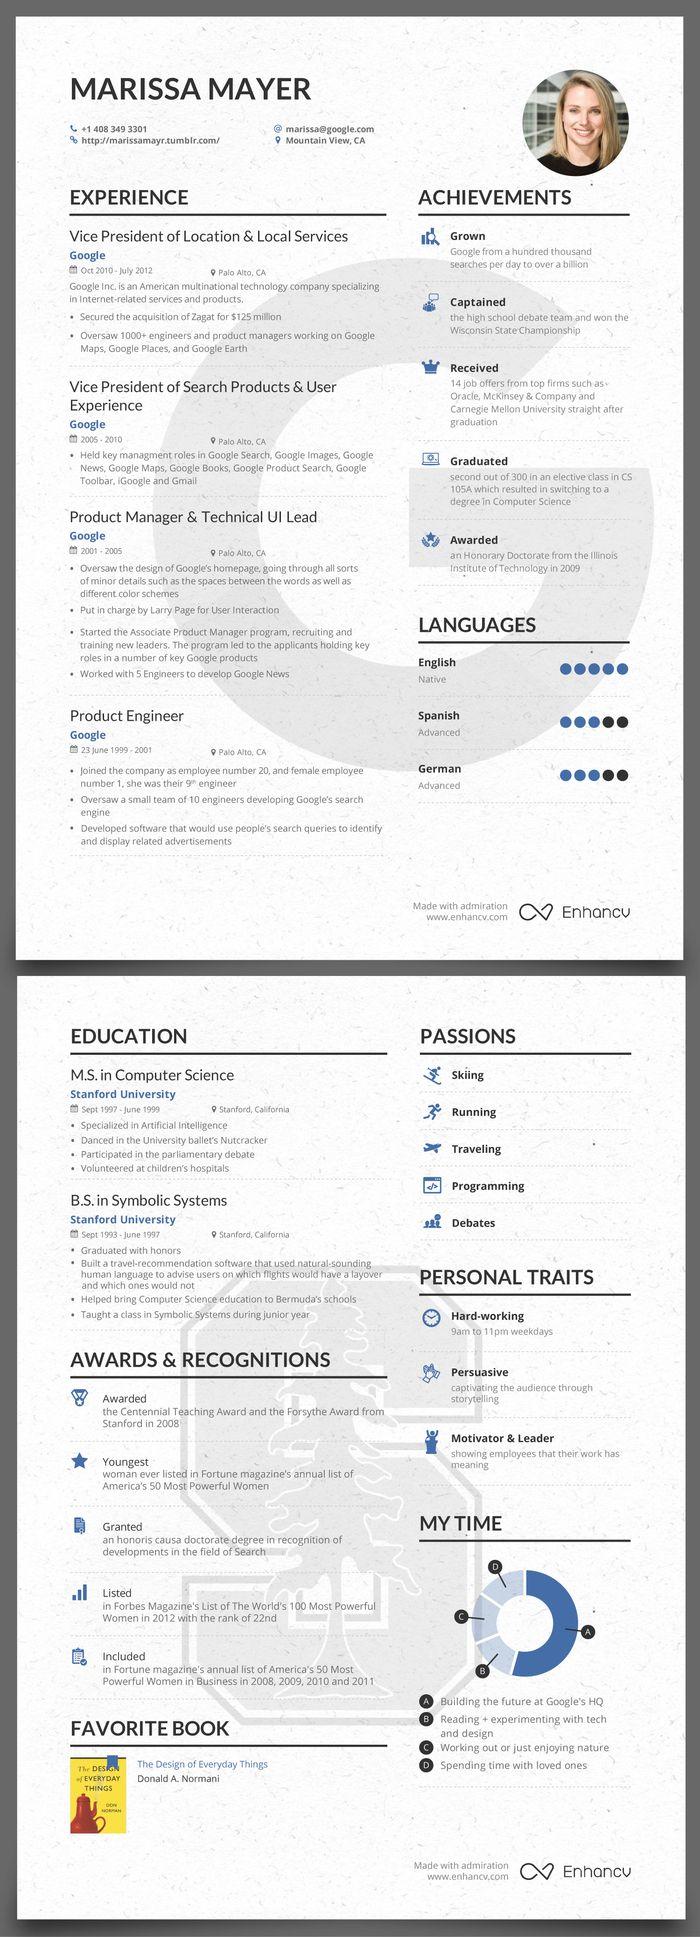 Marissa Mayer's CV Tips and Tricks Resume writing